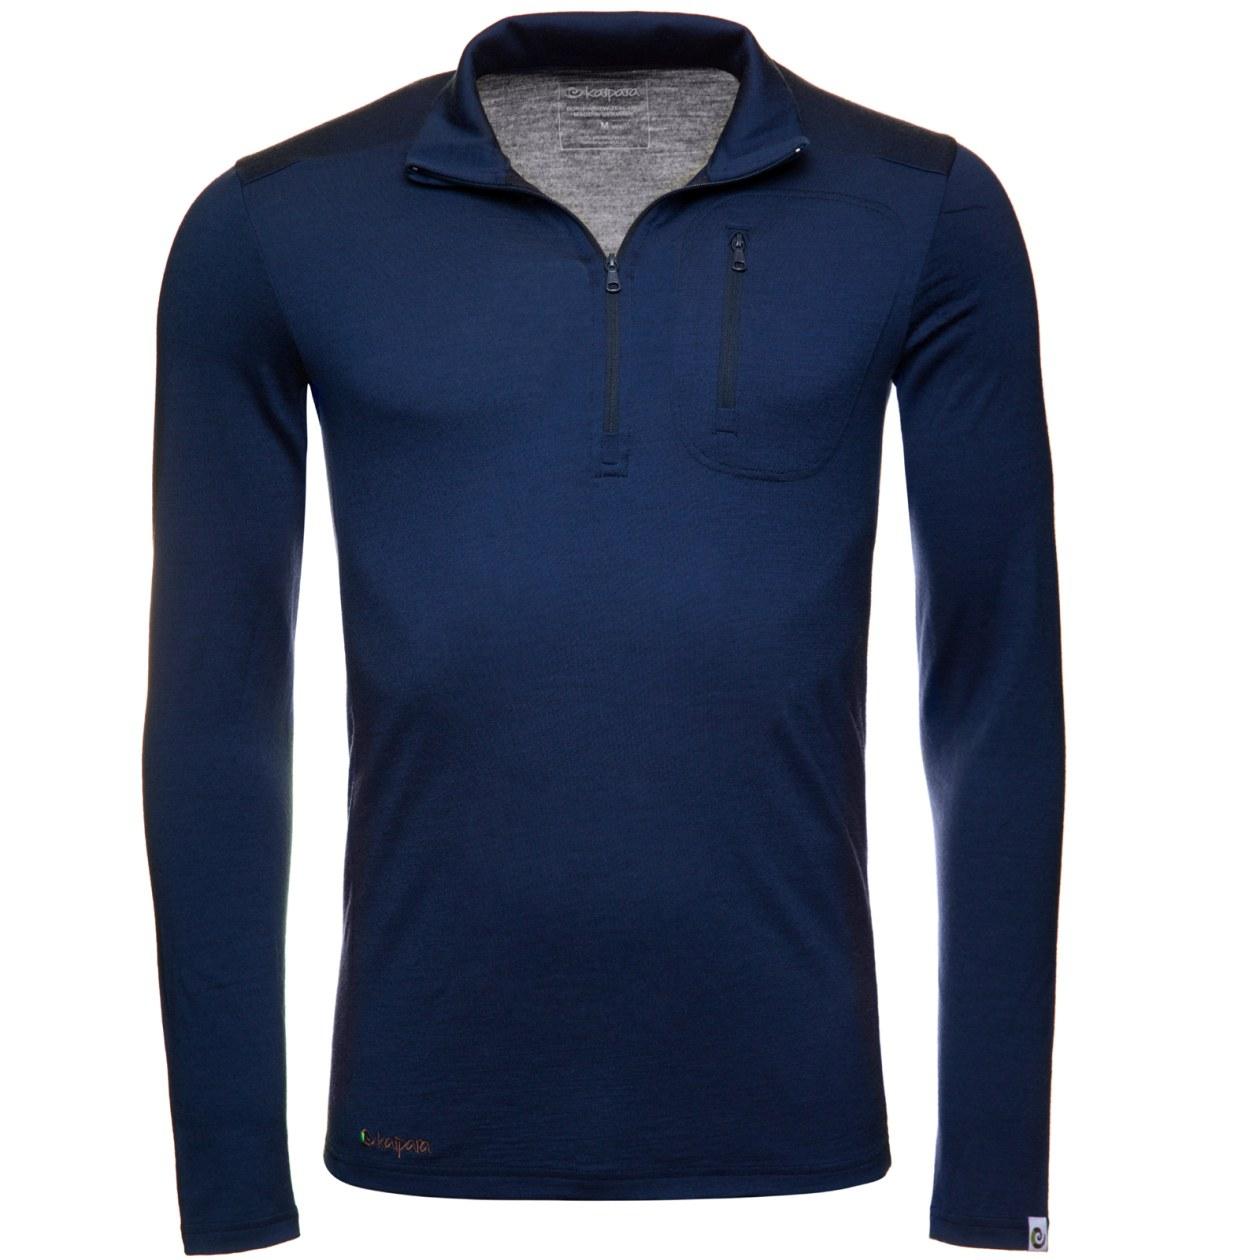 Merino Zip-Neck Herren Slimfit 200 mit Brusttasche Blau / S